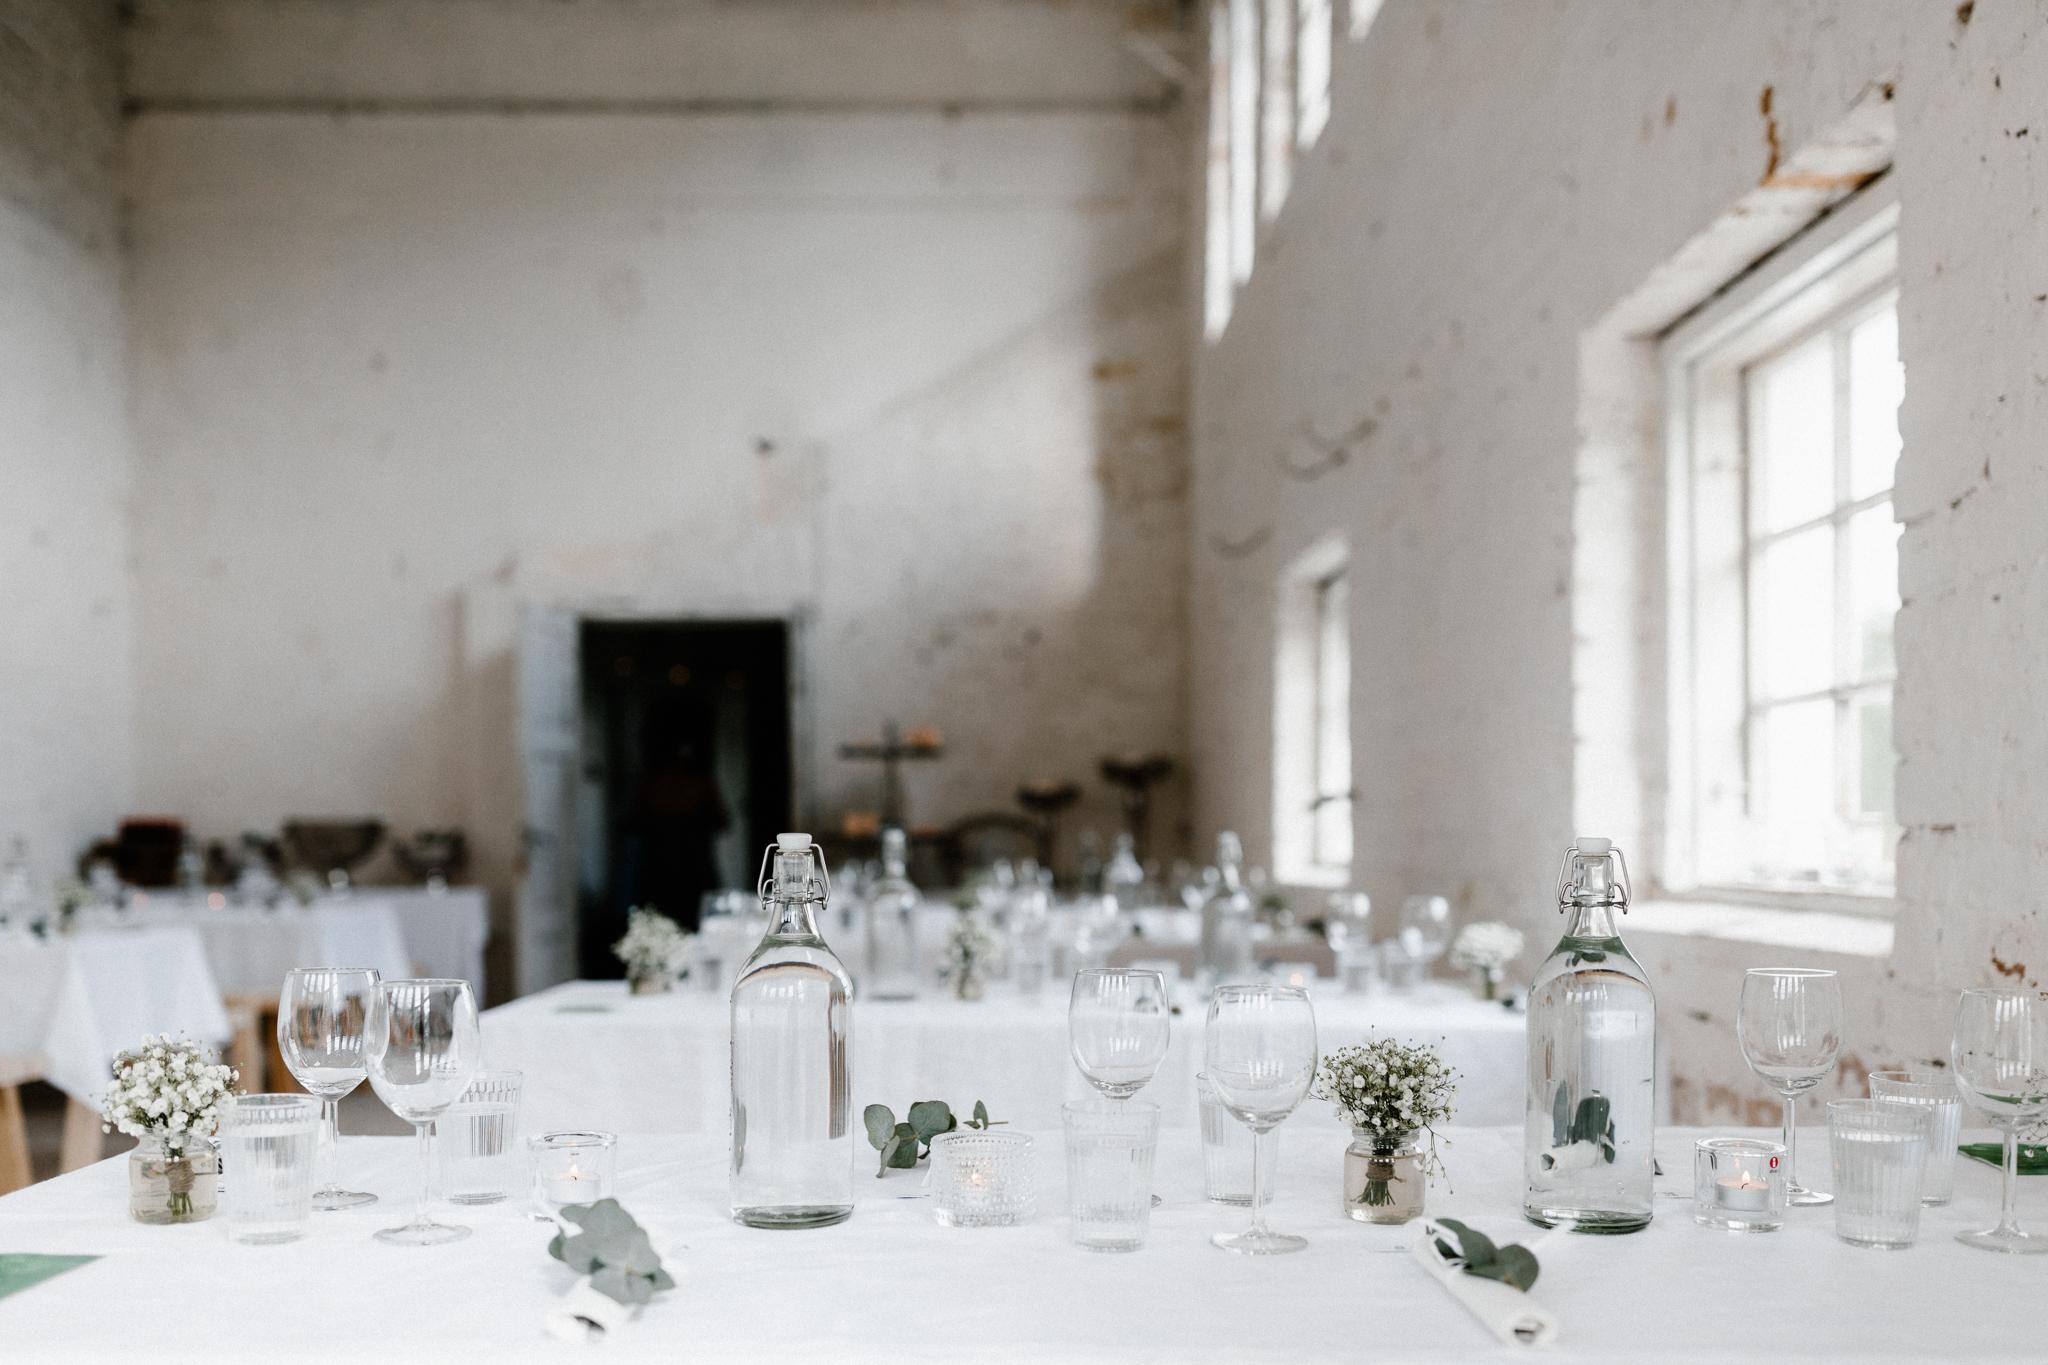 Essi + Ville   Oitbacka Gården   by Patrick Karkkolainen Wedding Photography-188.jpg